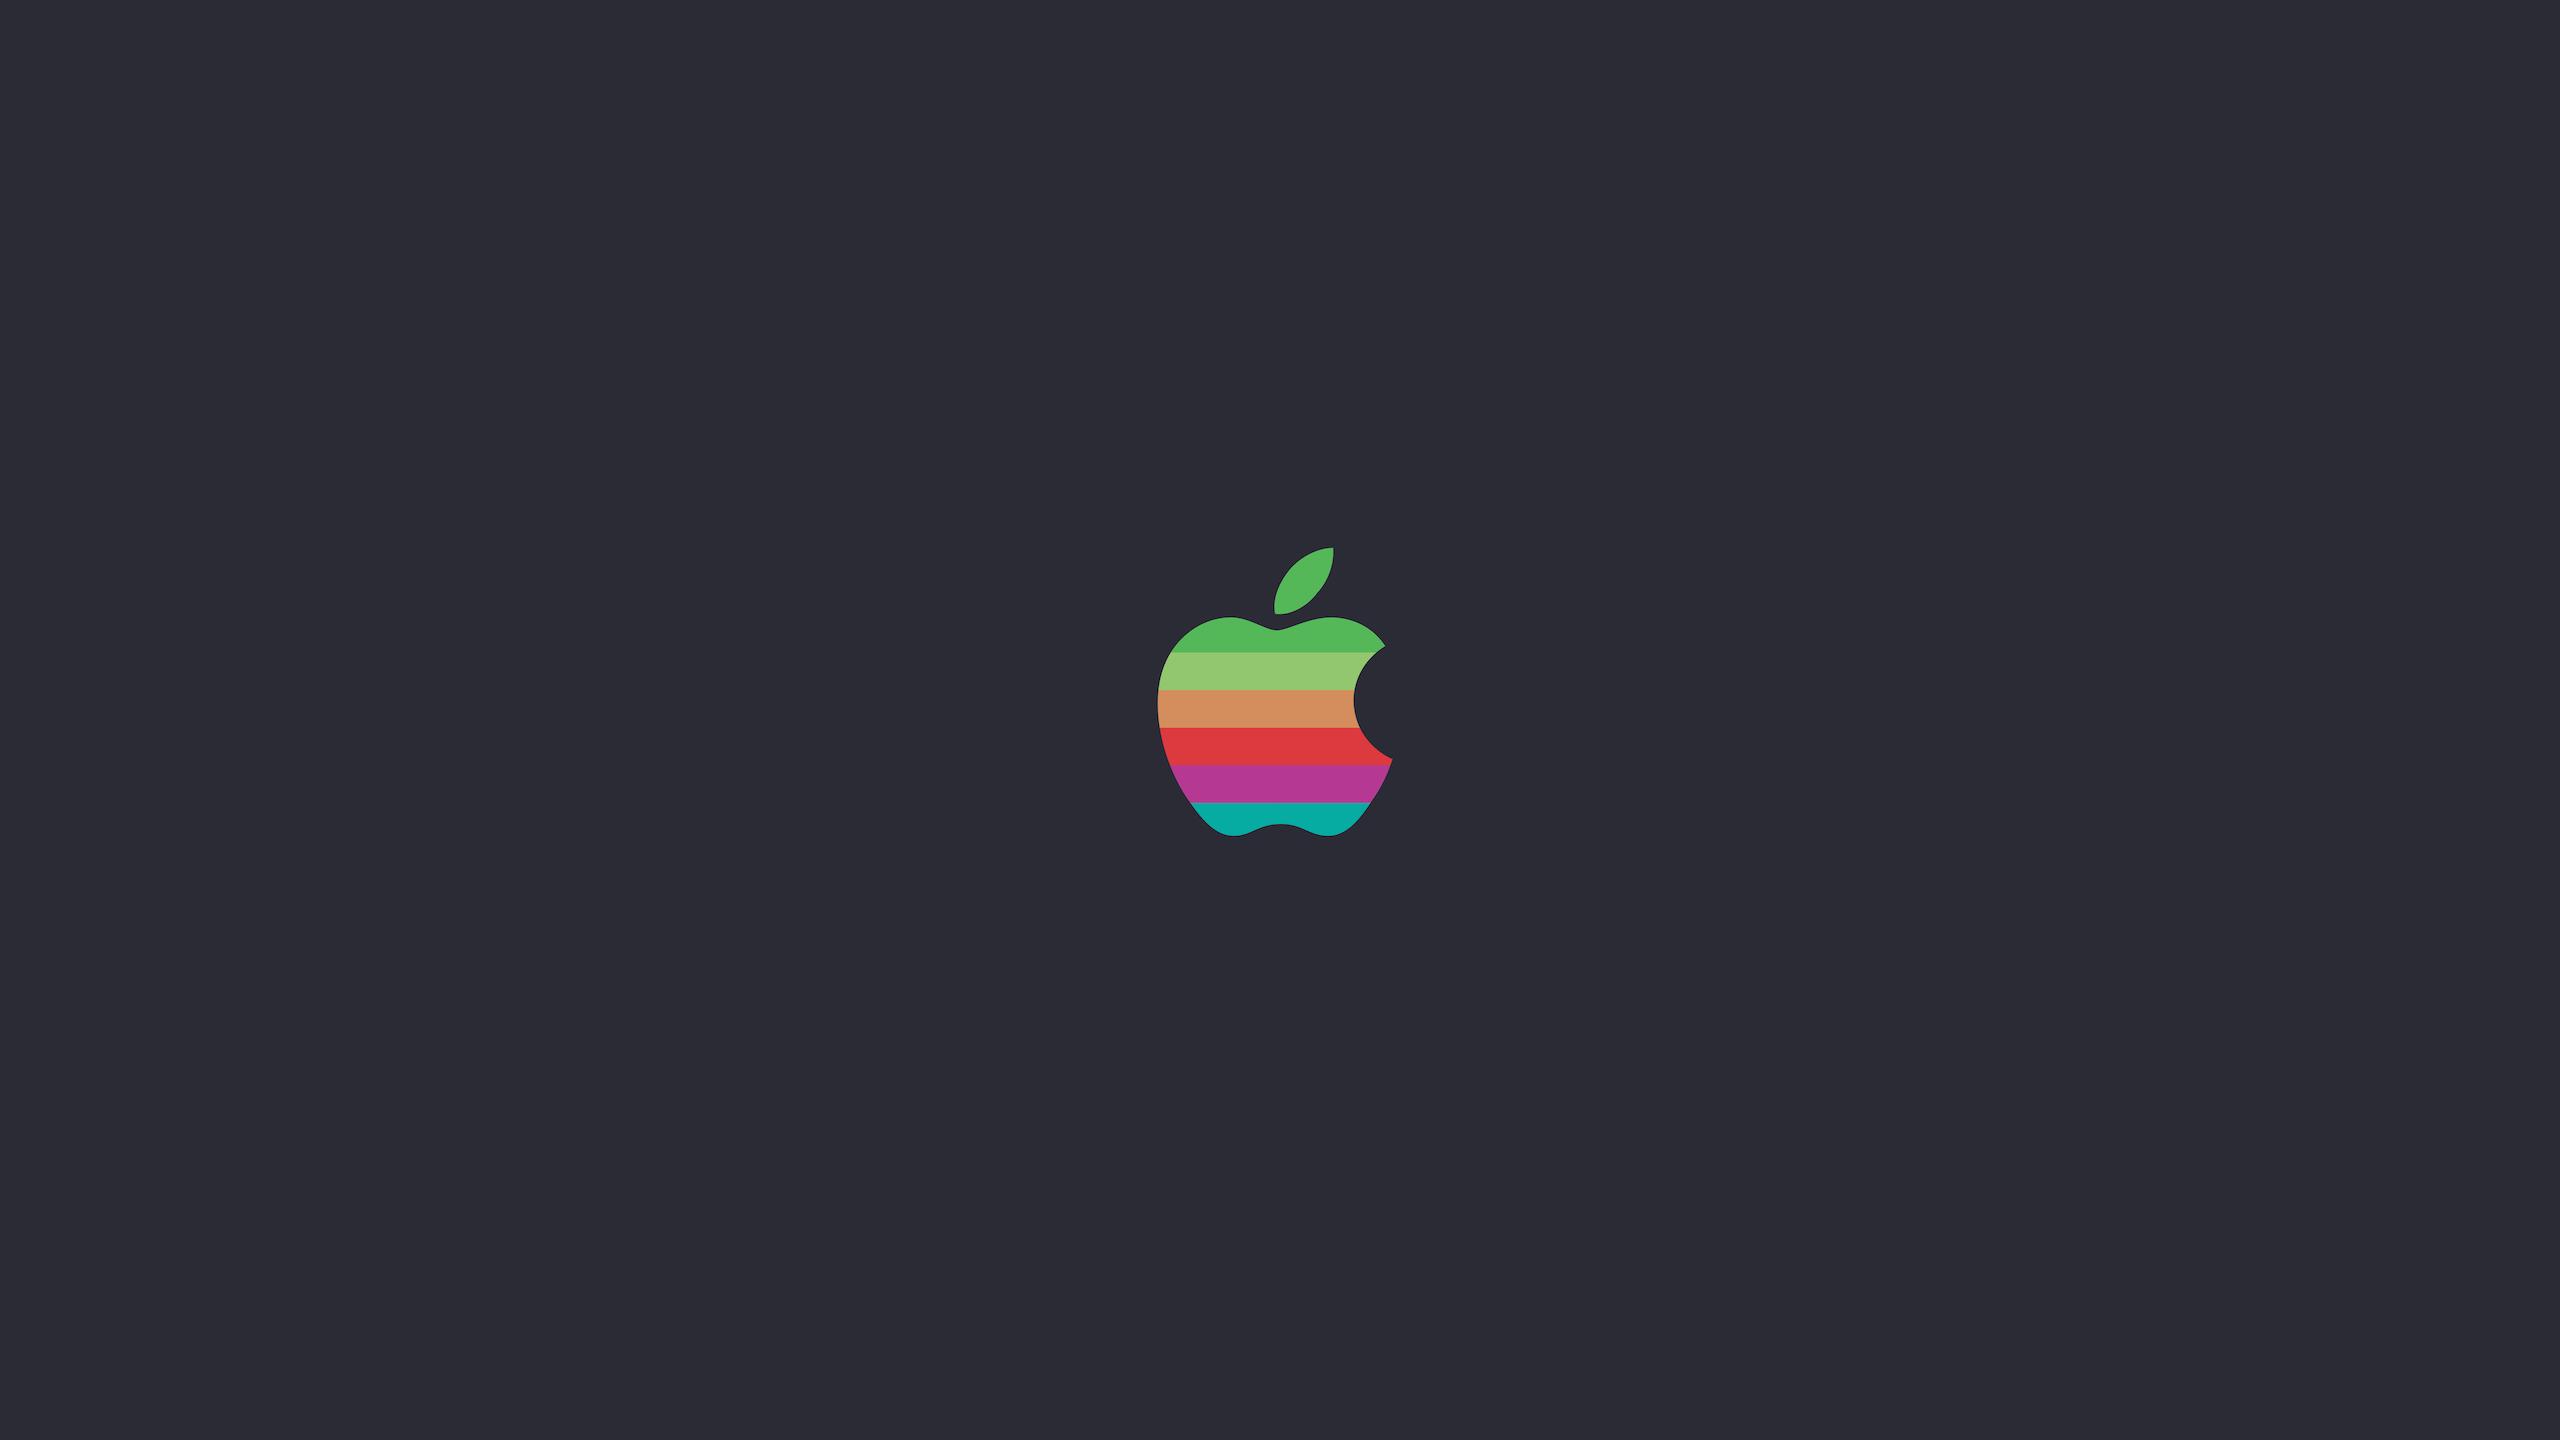 Apple Background Apple Background Black Pink Rainbow Brands 1510